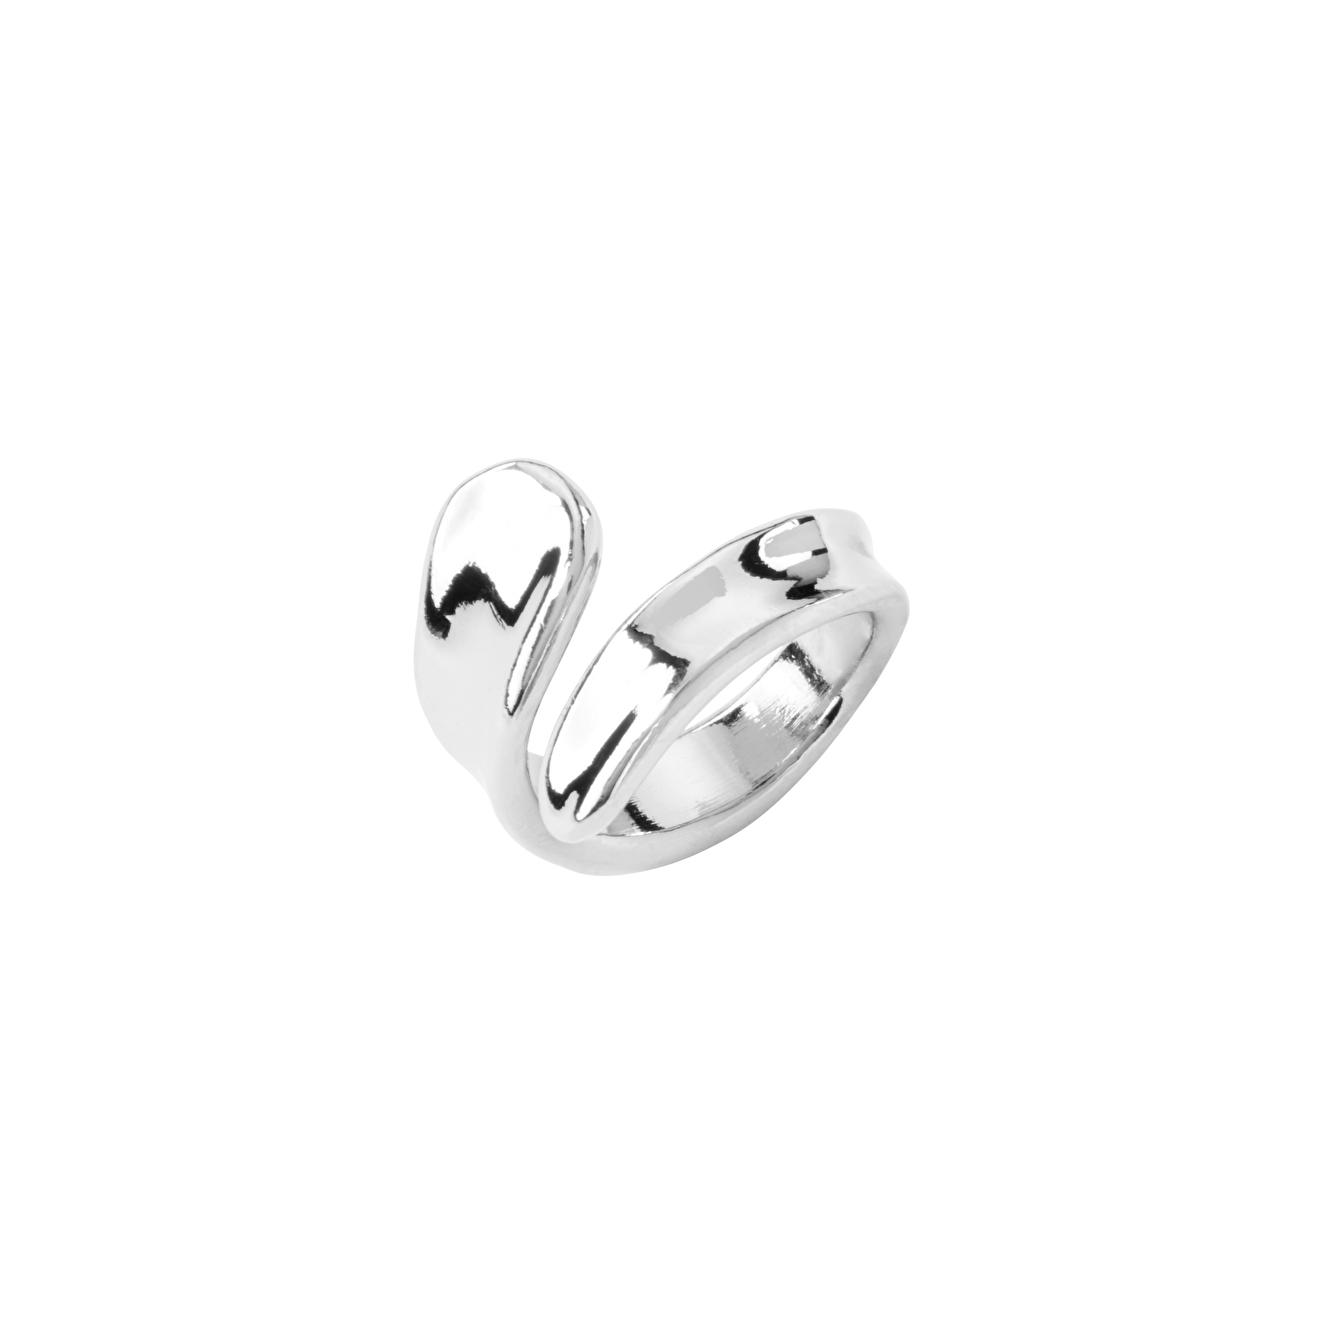 Unode50 Покрытое серебром кольцо Kanawa beach, из коллекции Indonesia недорого